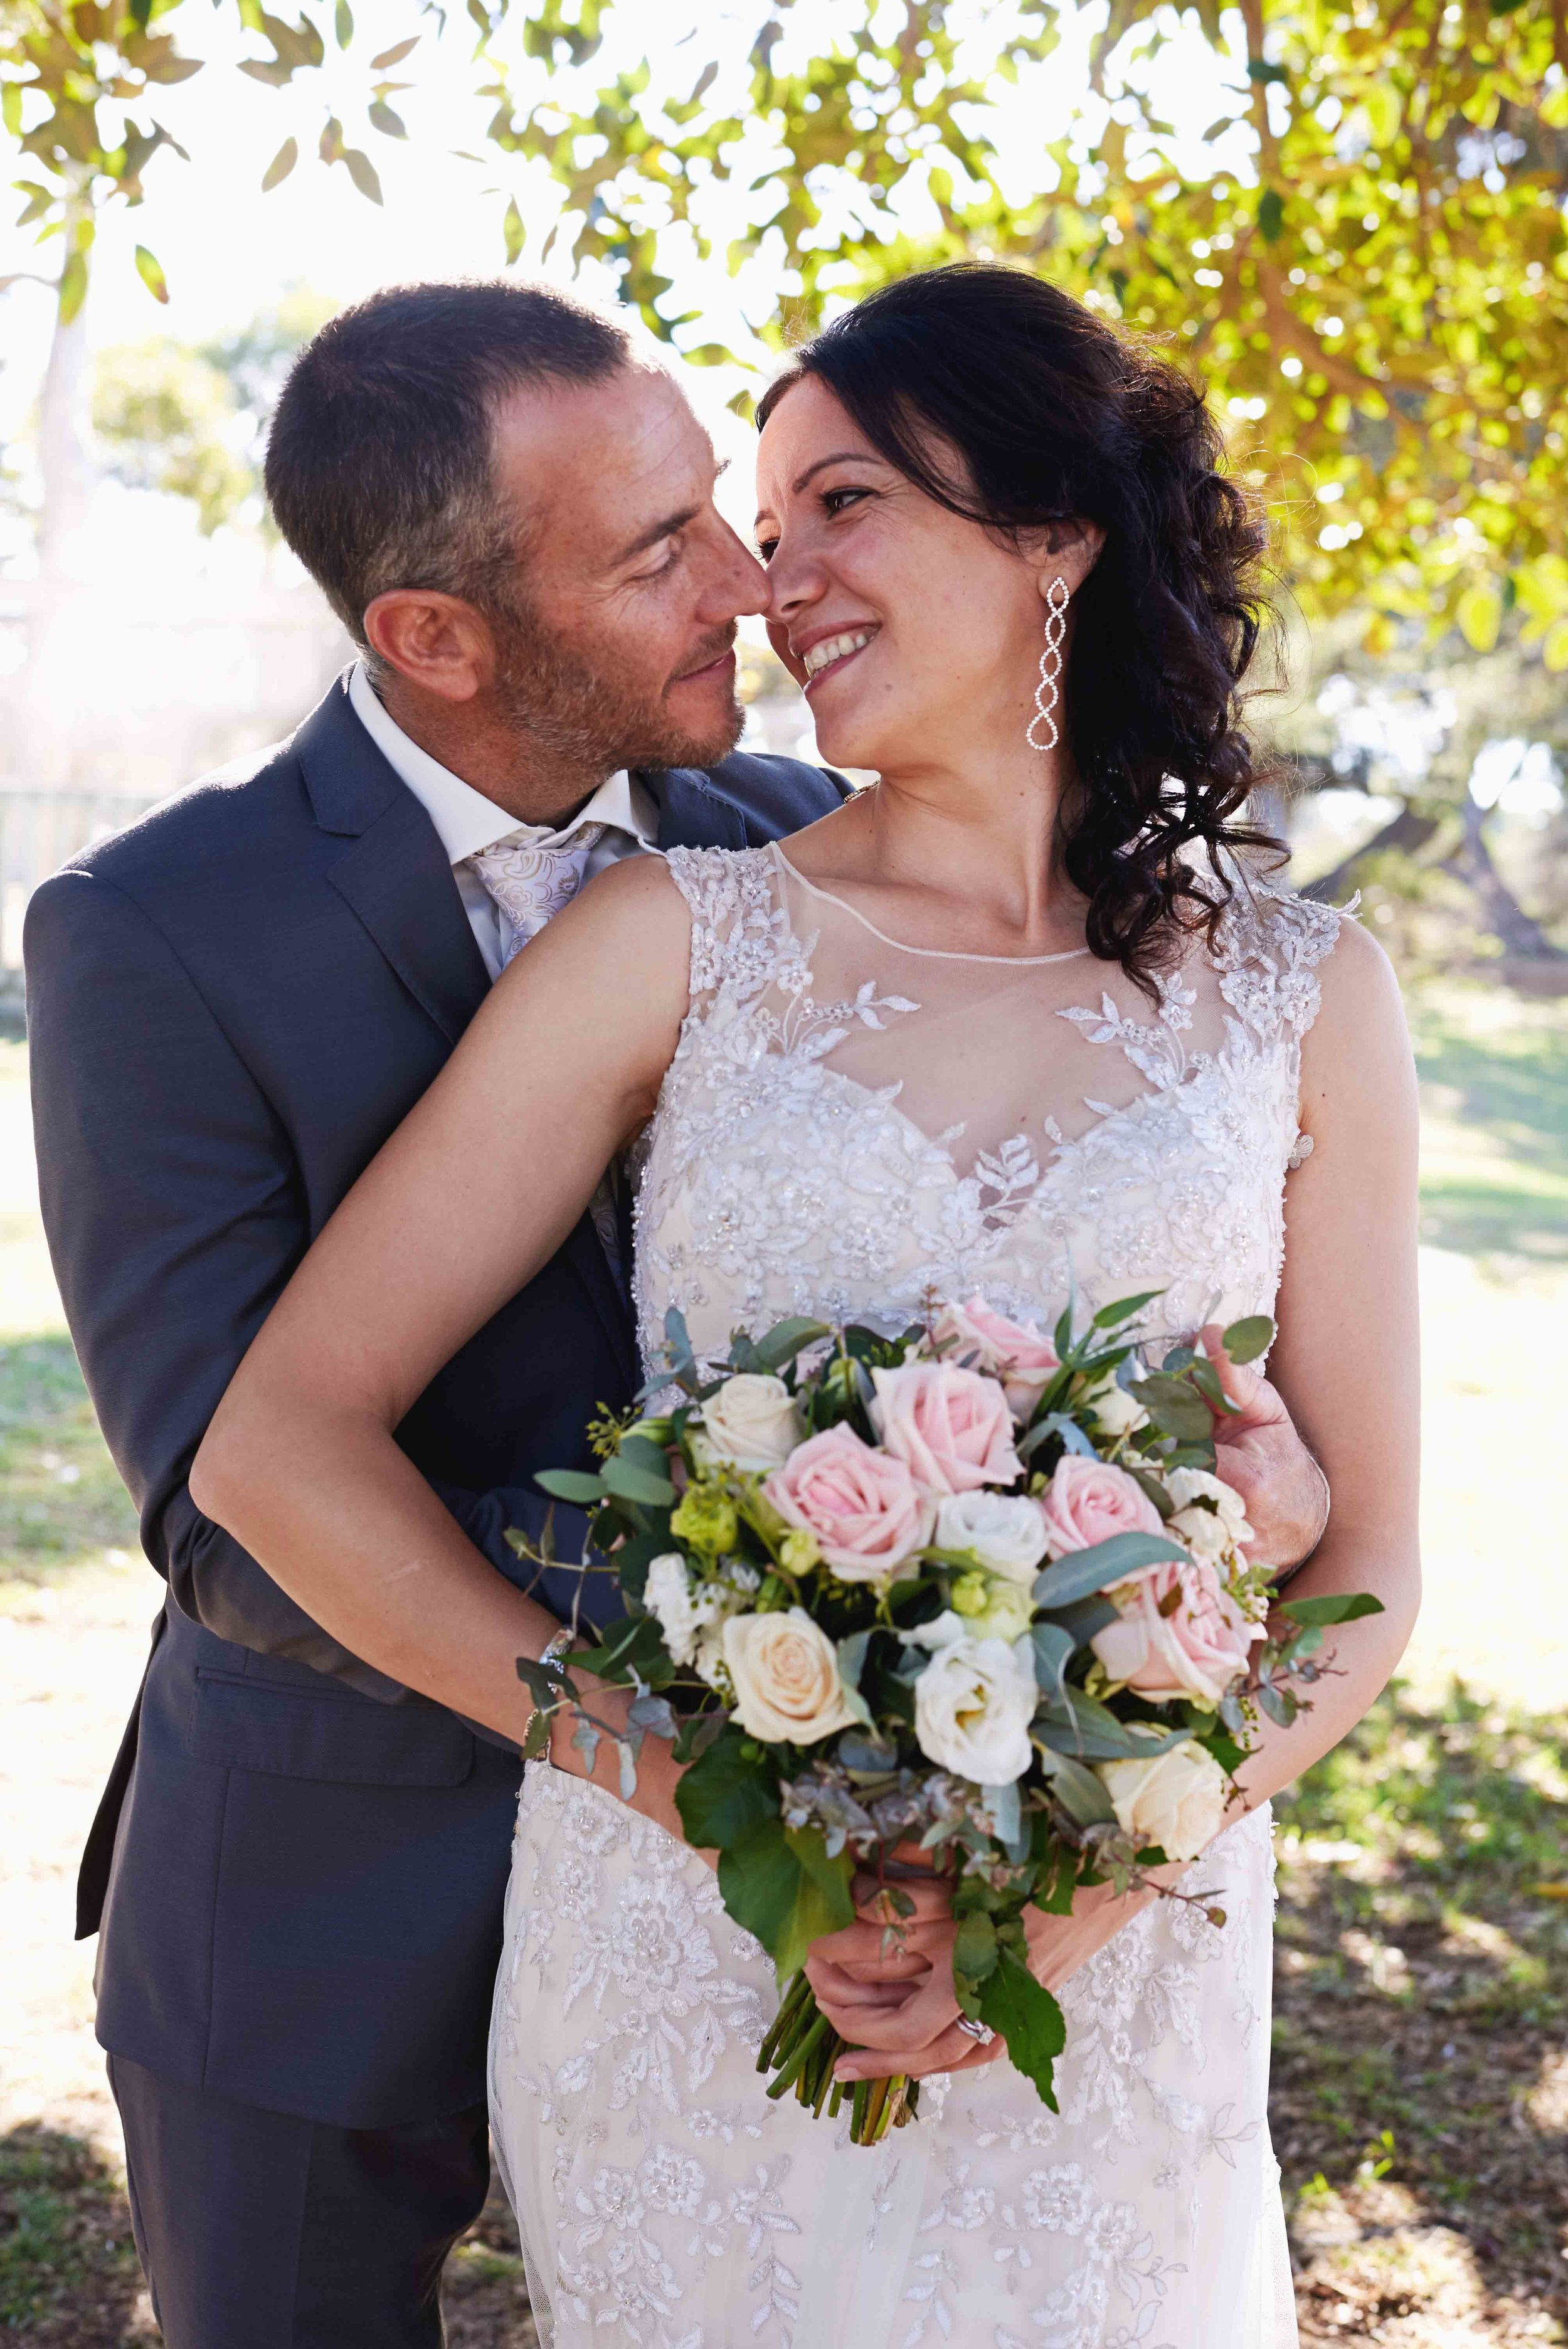 sorrento-wedding-photography-all-smiles-marissa-jade-photography-154.jpg